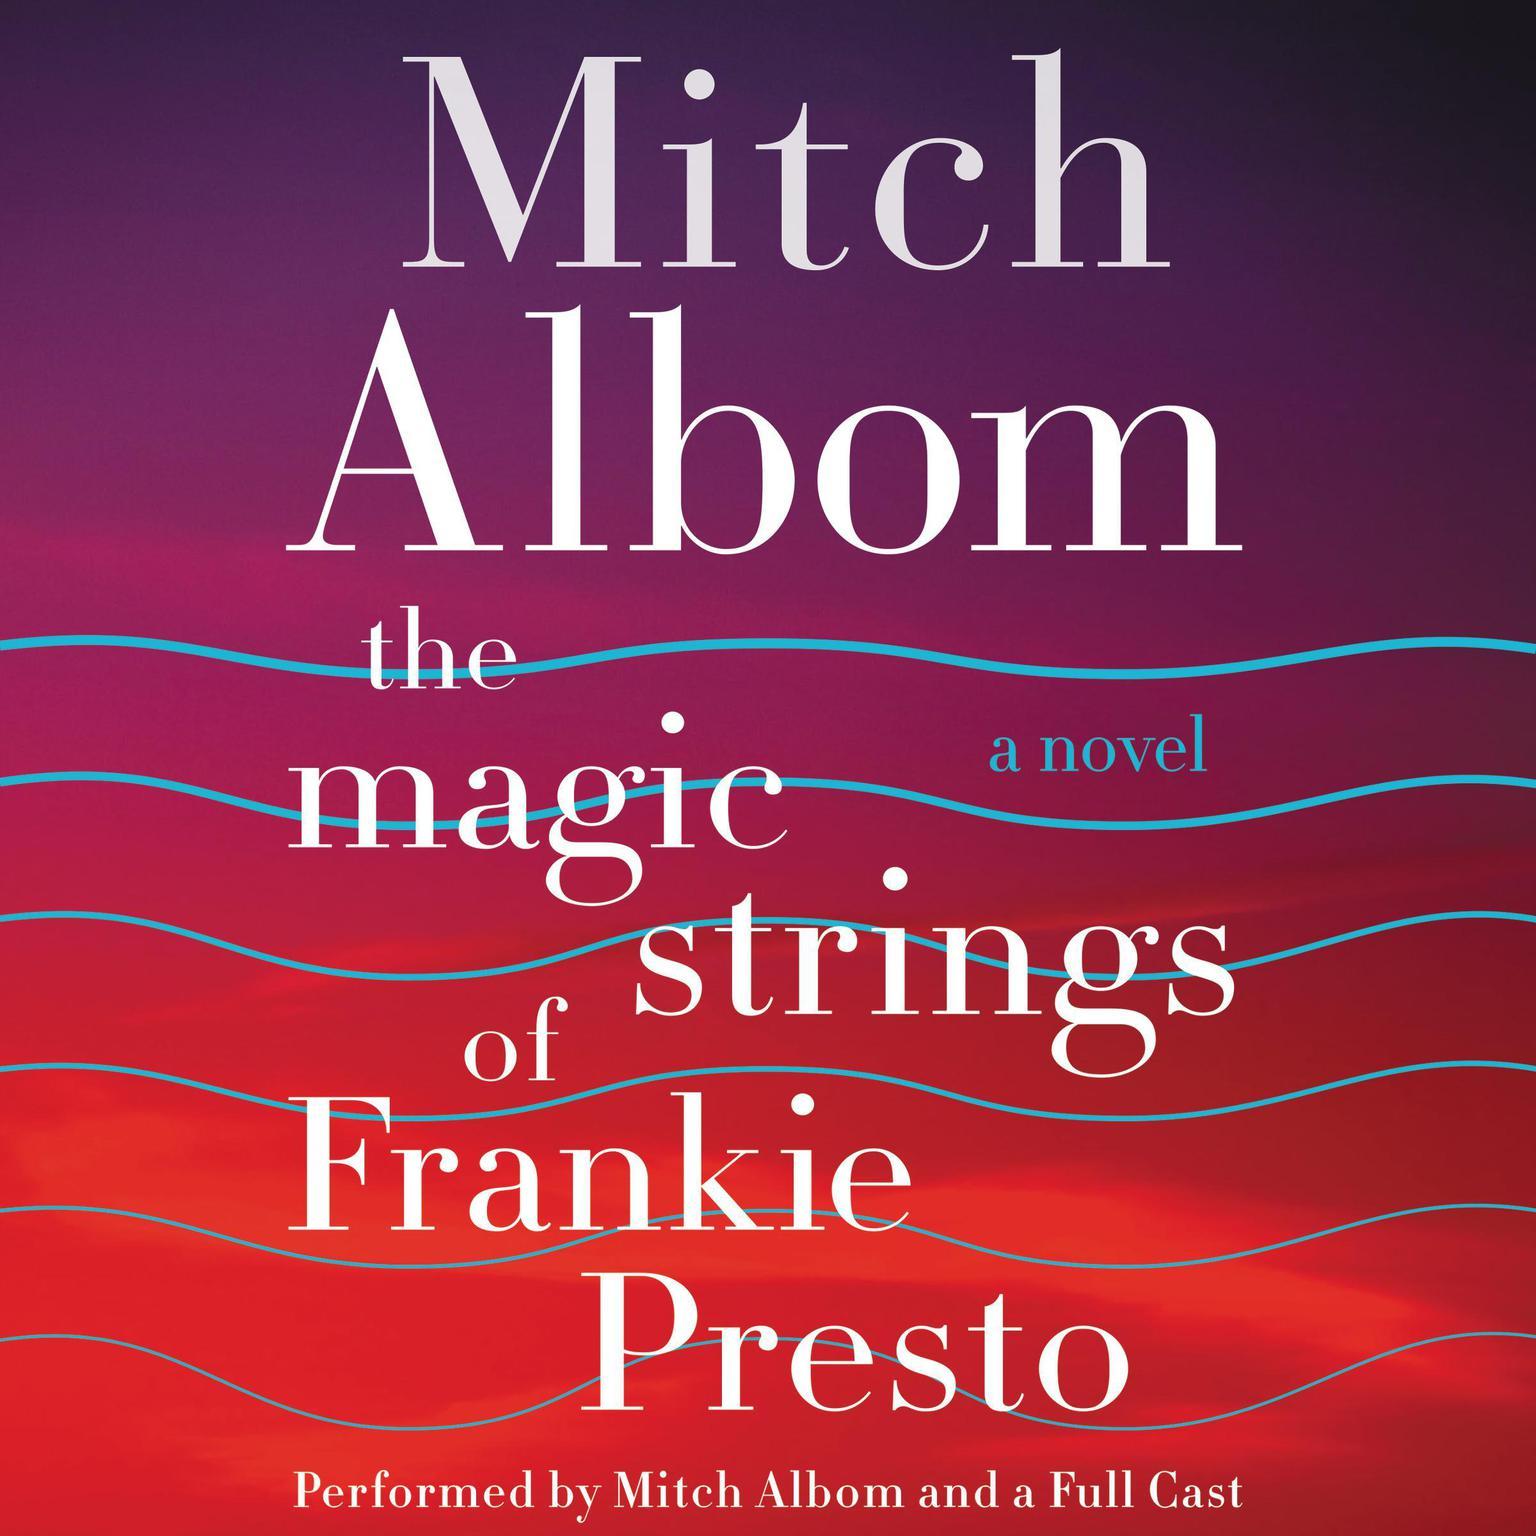 The Magic Strings of Frankie Presto: A Novel Audiobook, by Mitch Albom